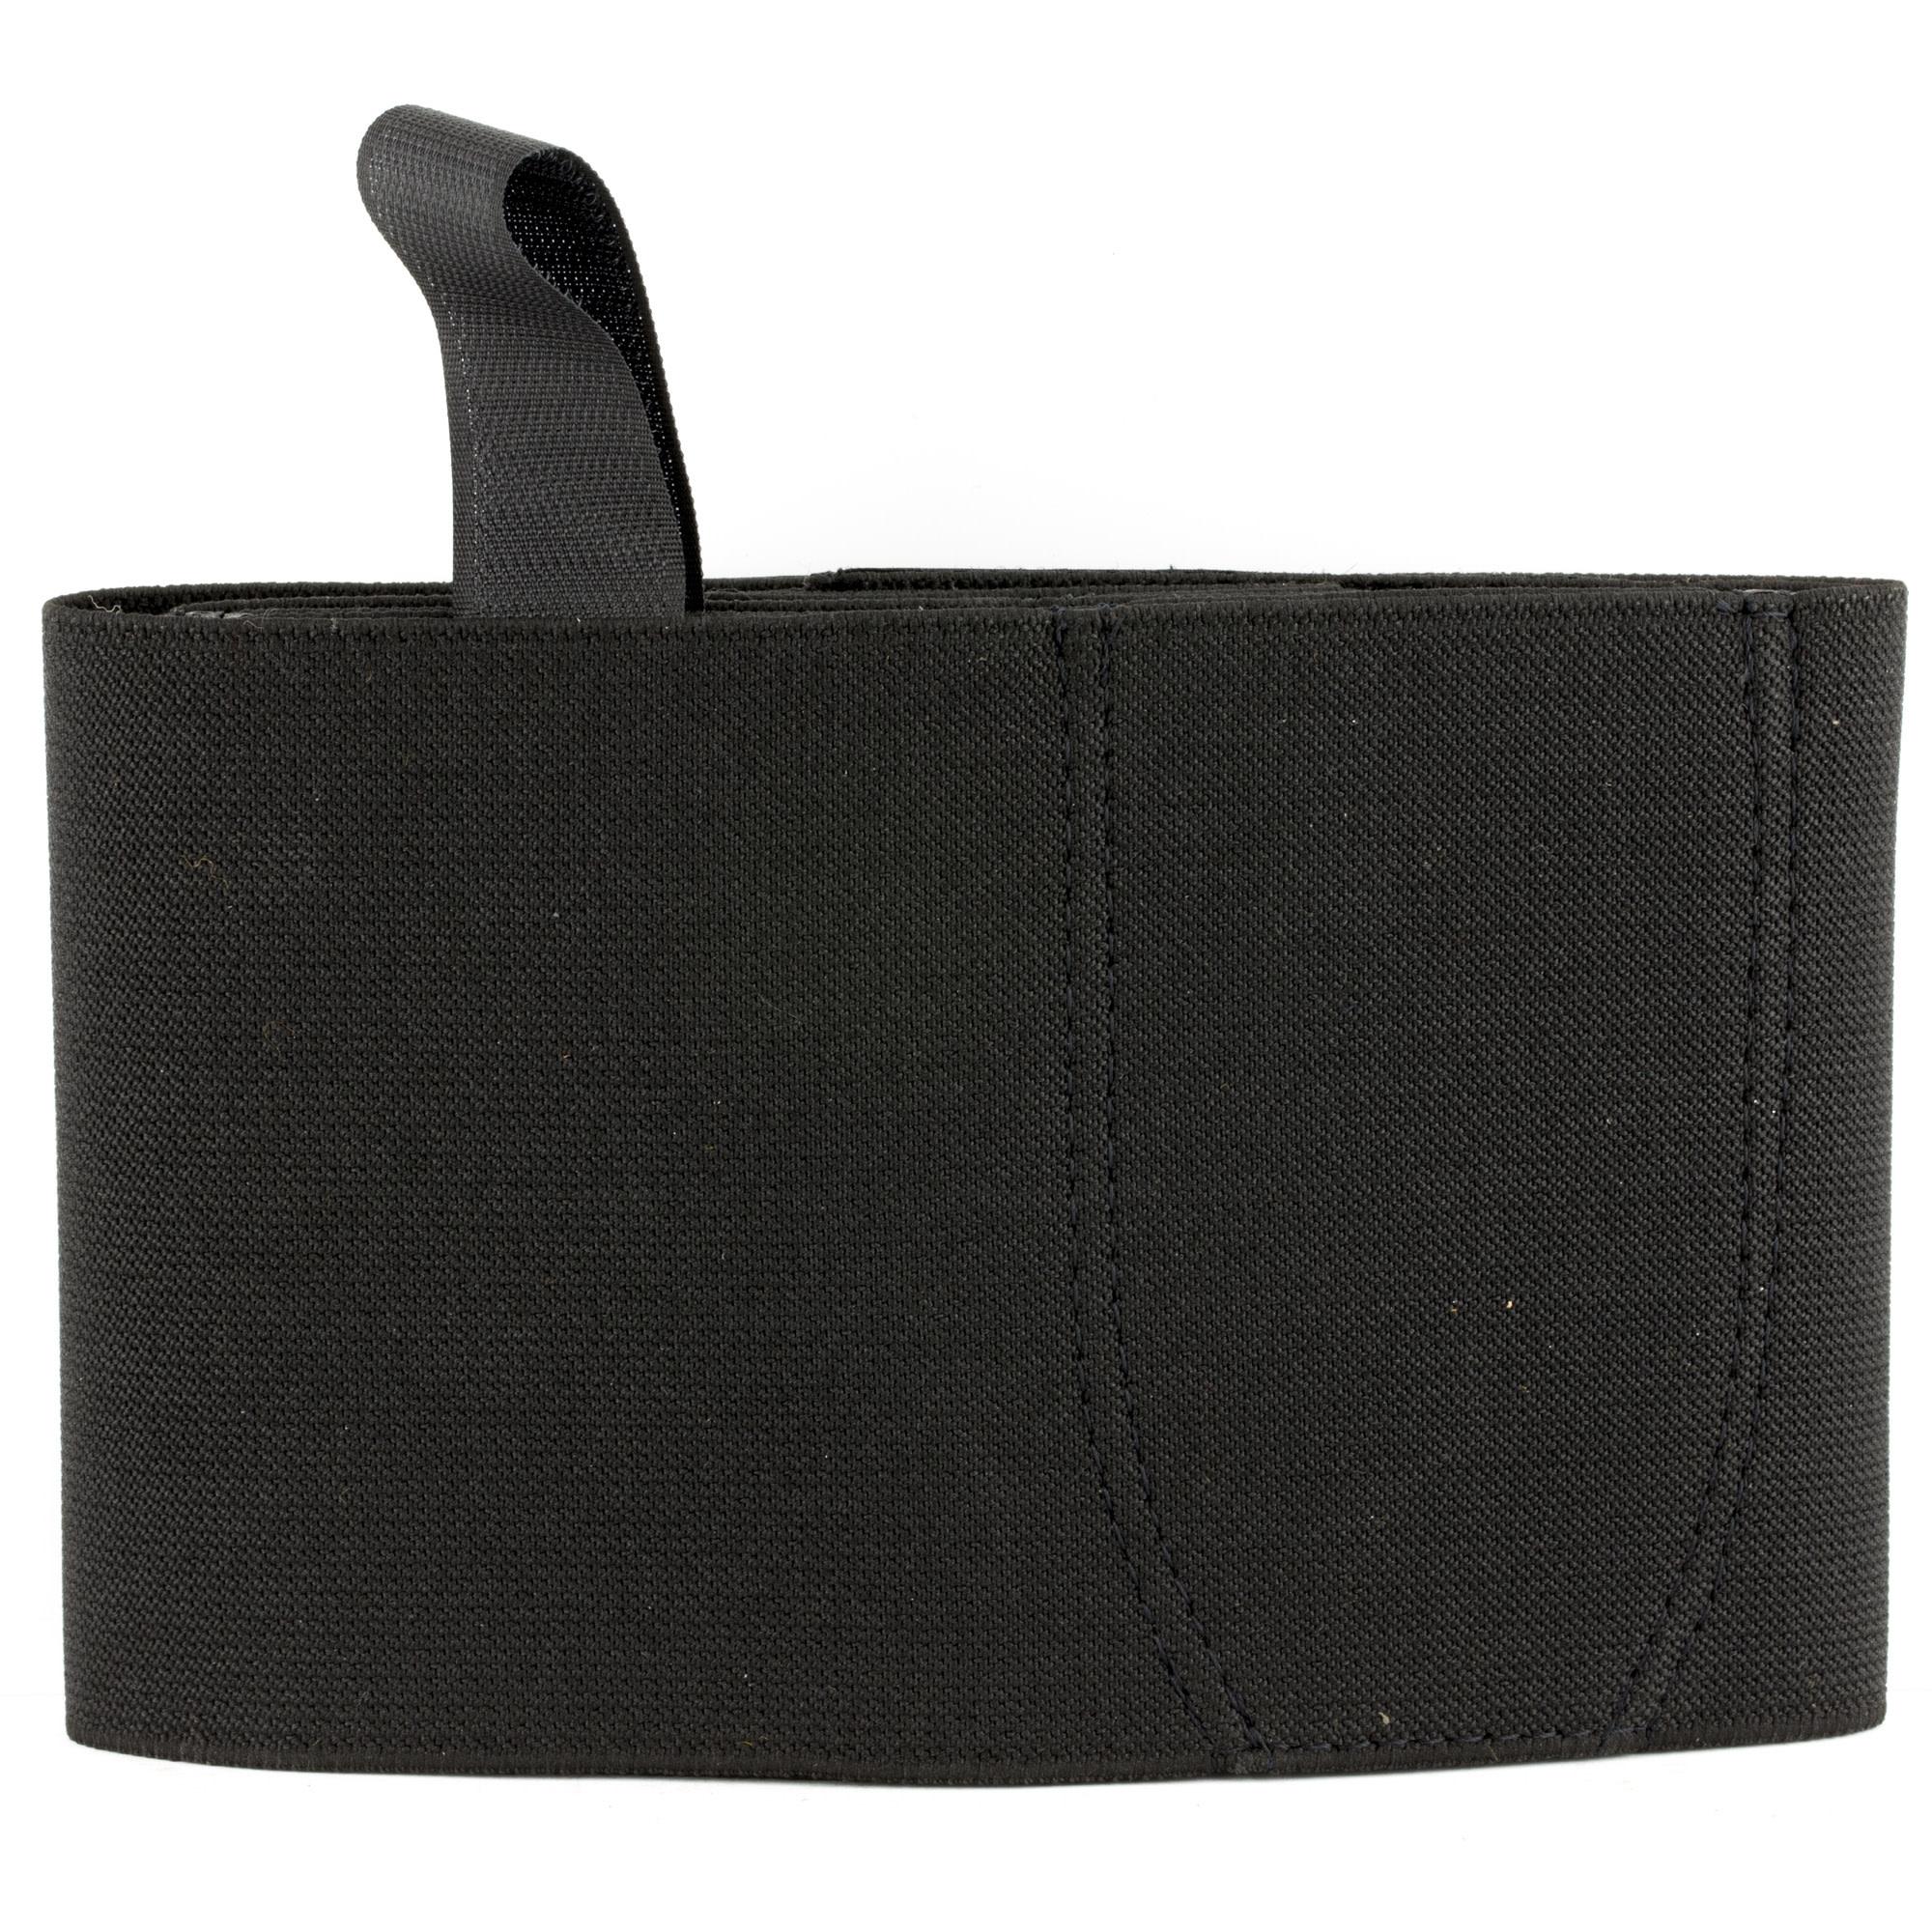 Desantis DeSantis Belly Band Holster Fits Most Small Frame Autos Medium Black